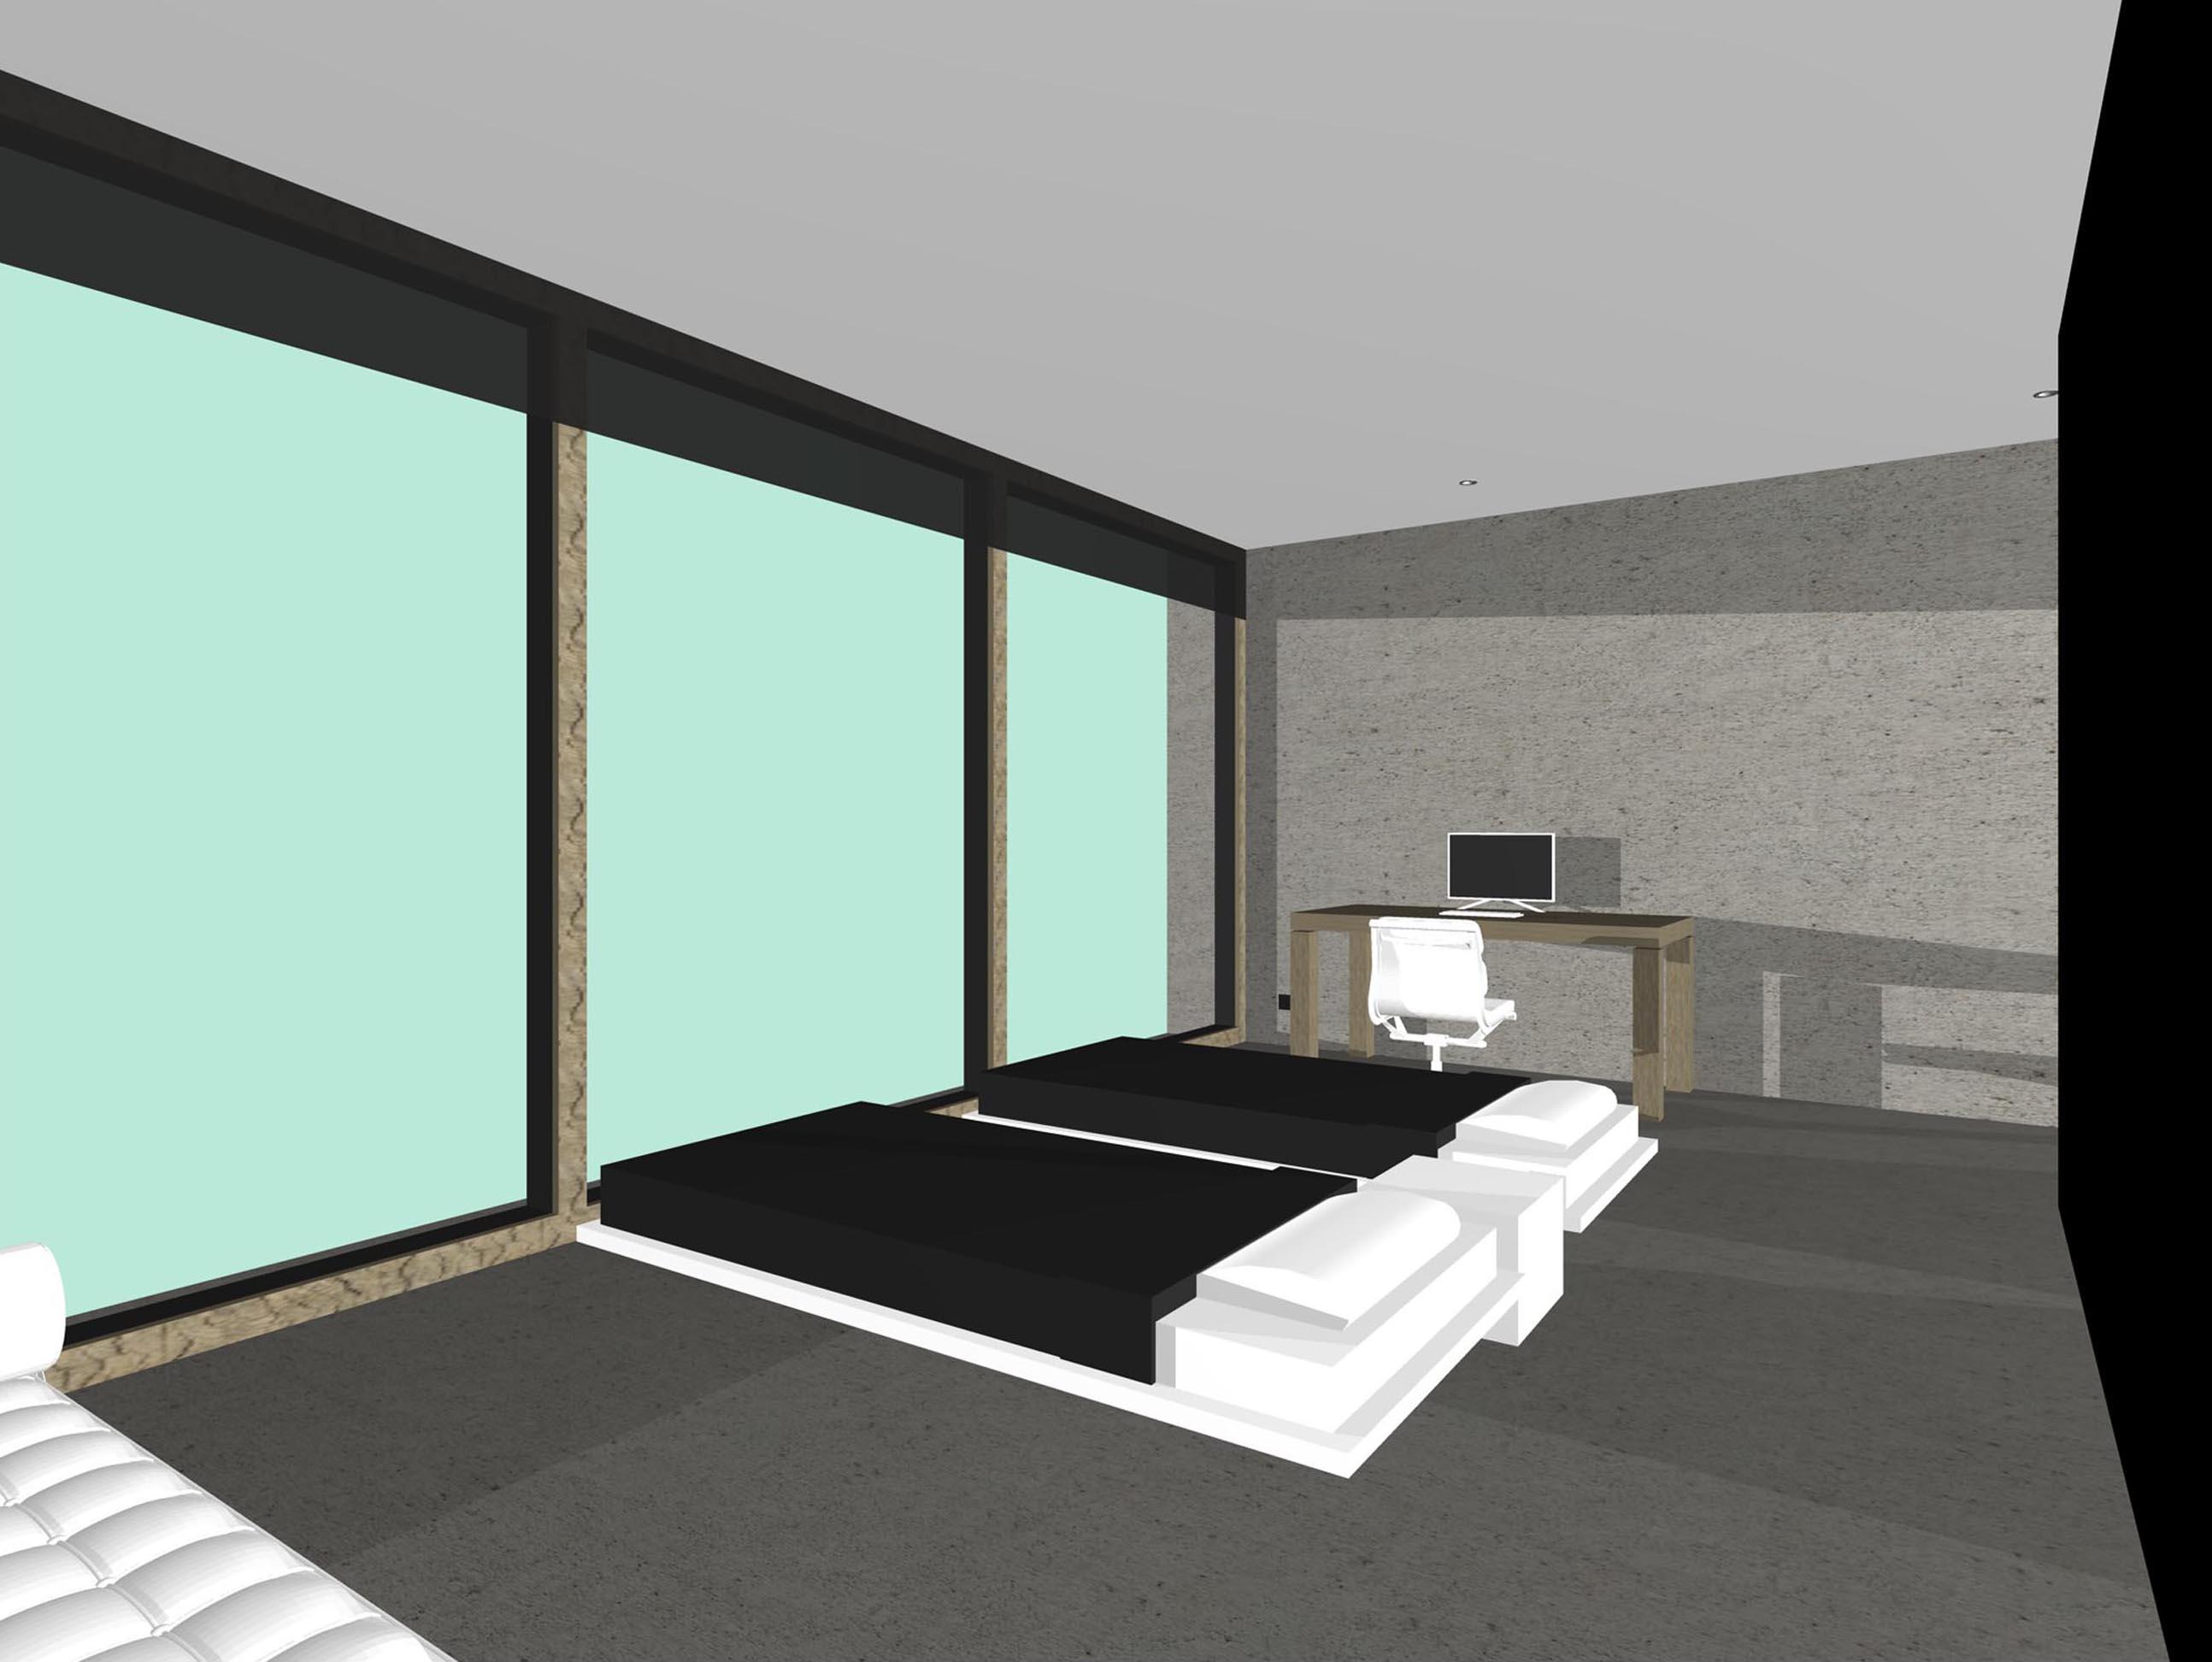 Interieur archieven pagina van studio